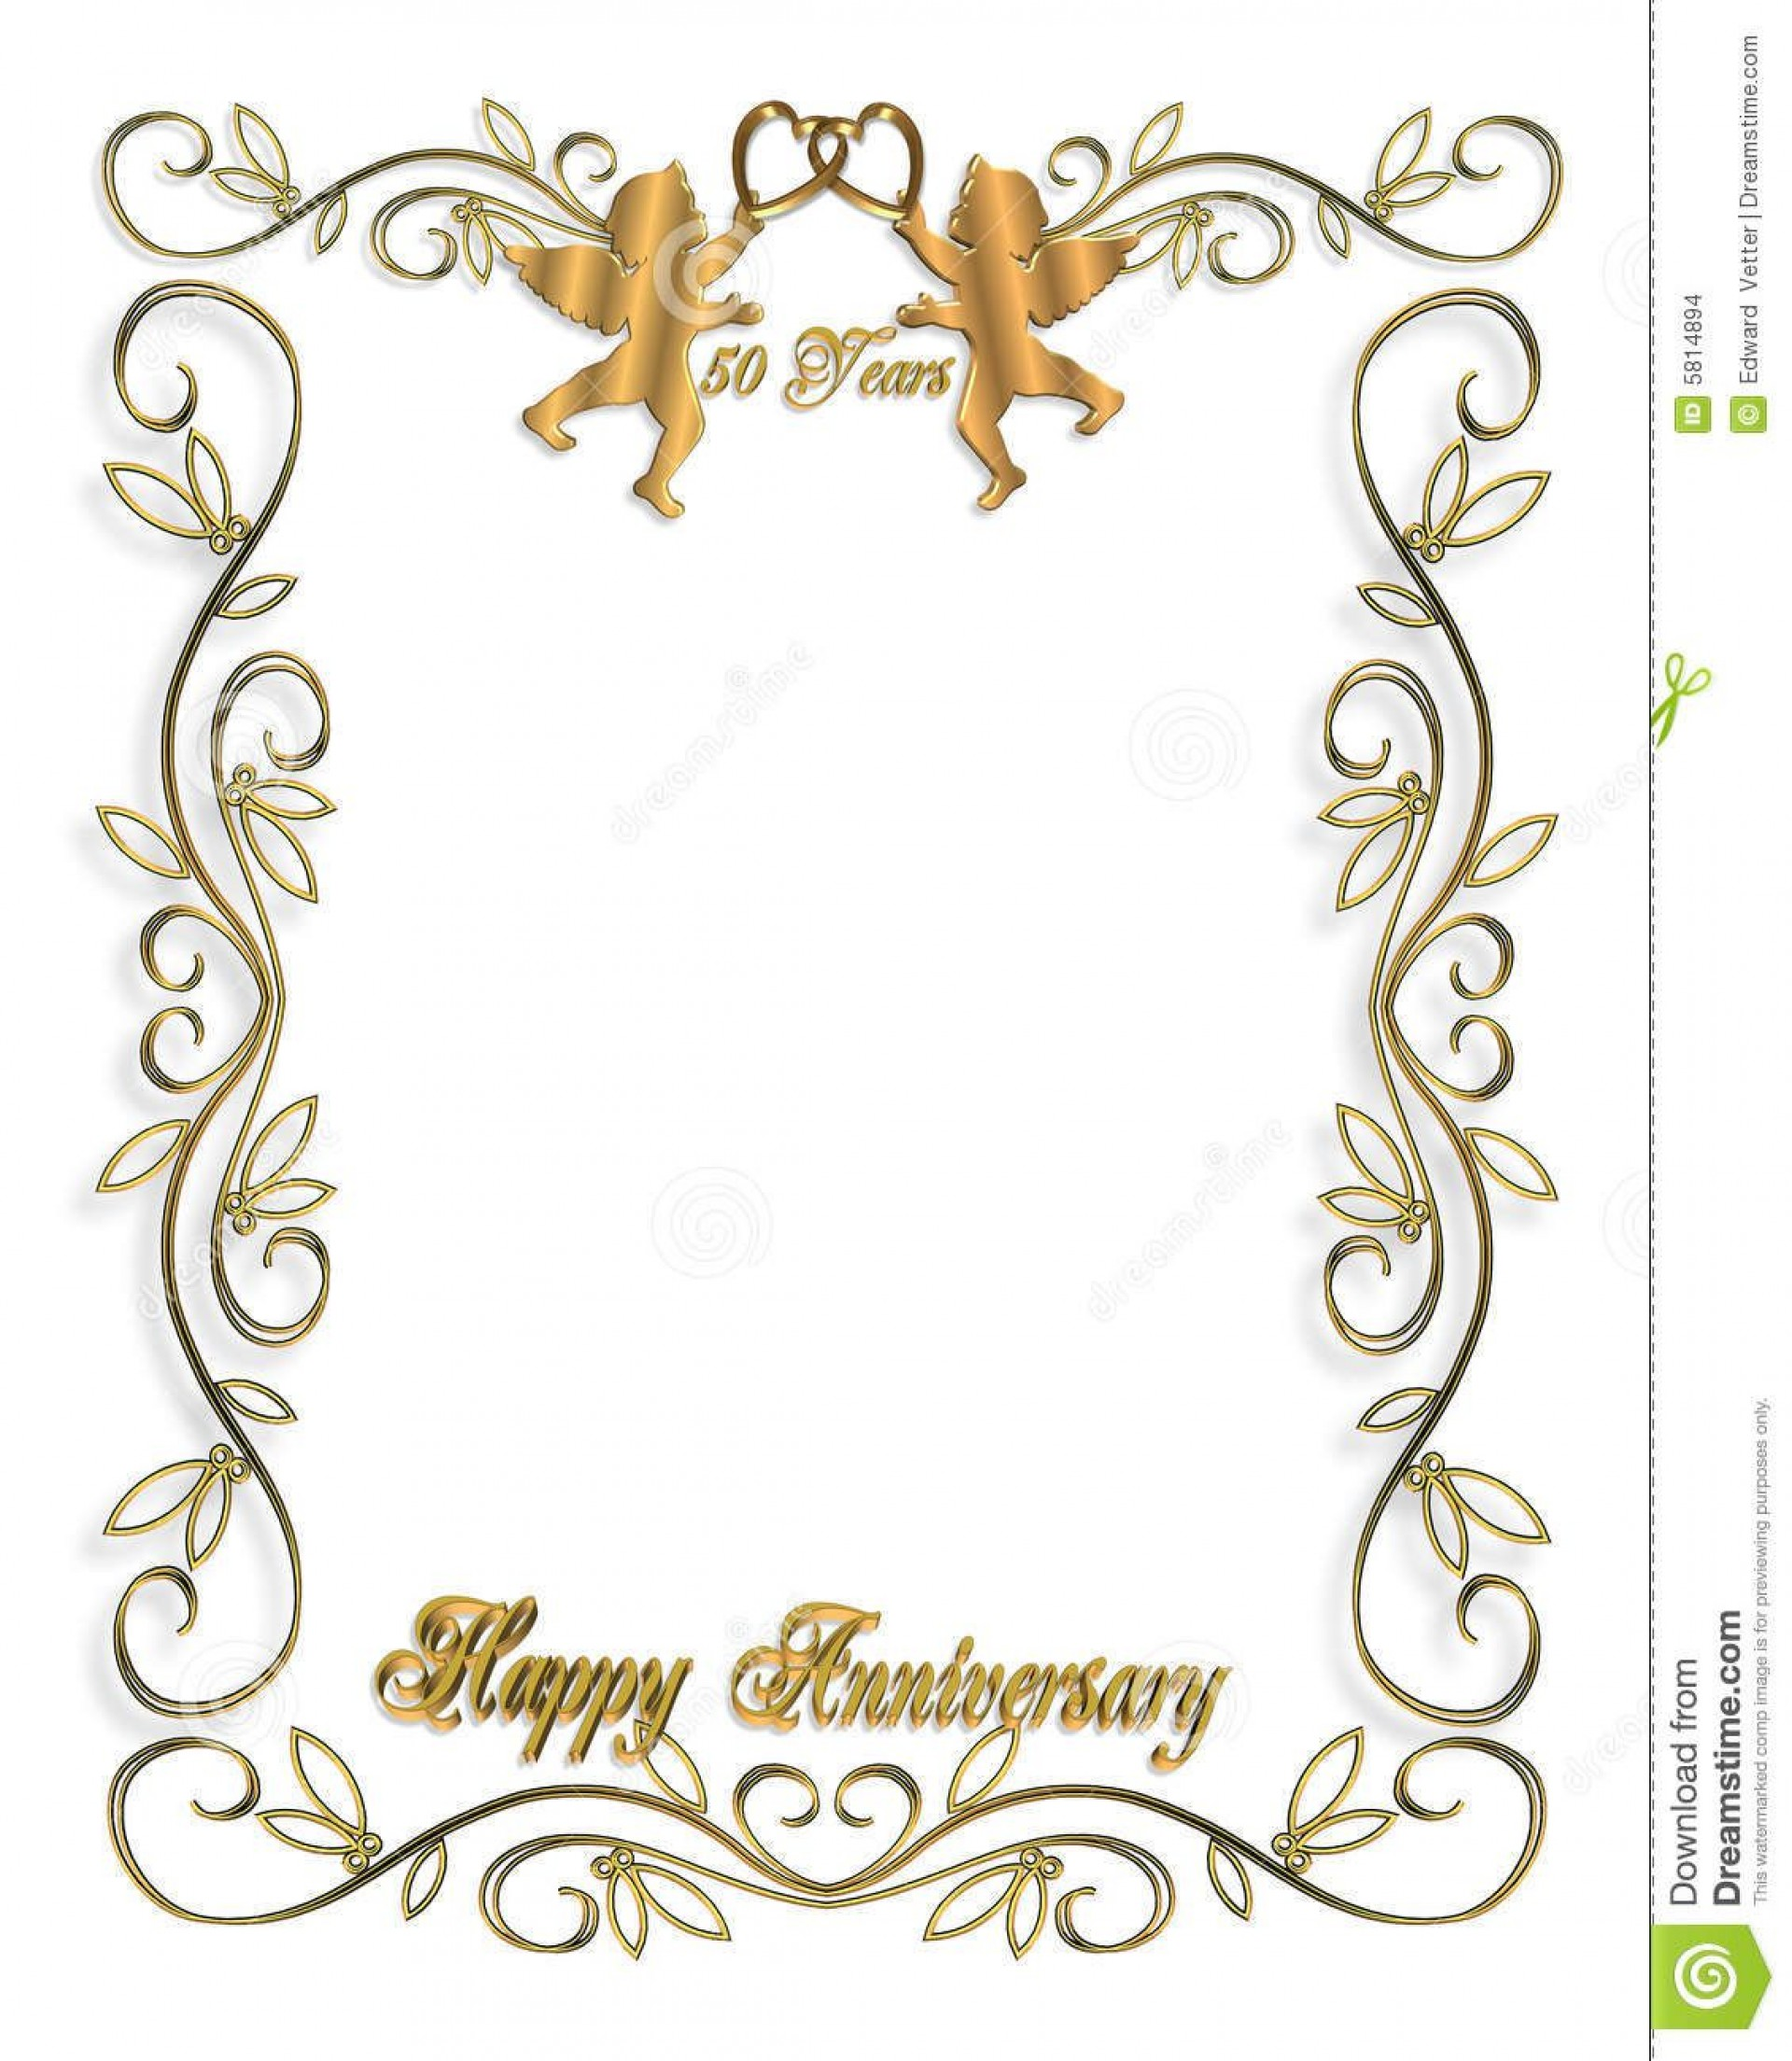 009 Excellent 50th Wedding Anniversary Invitation Template Free Design  Download Golden Microsoft Word1920